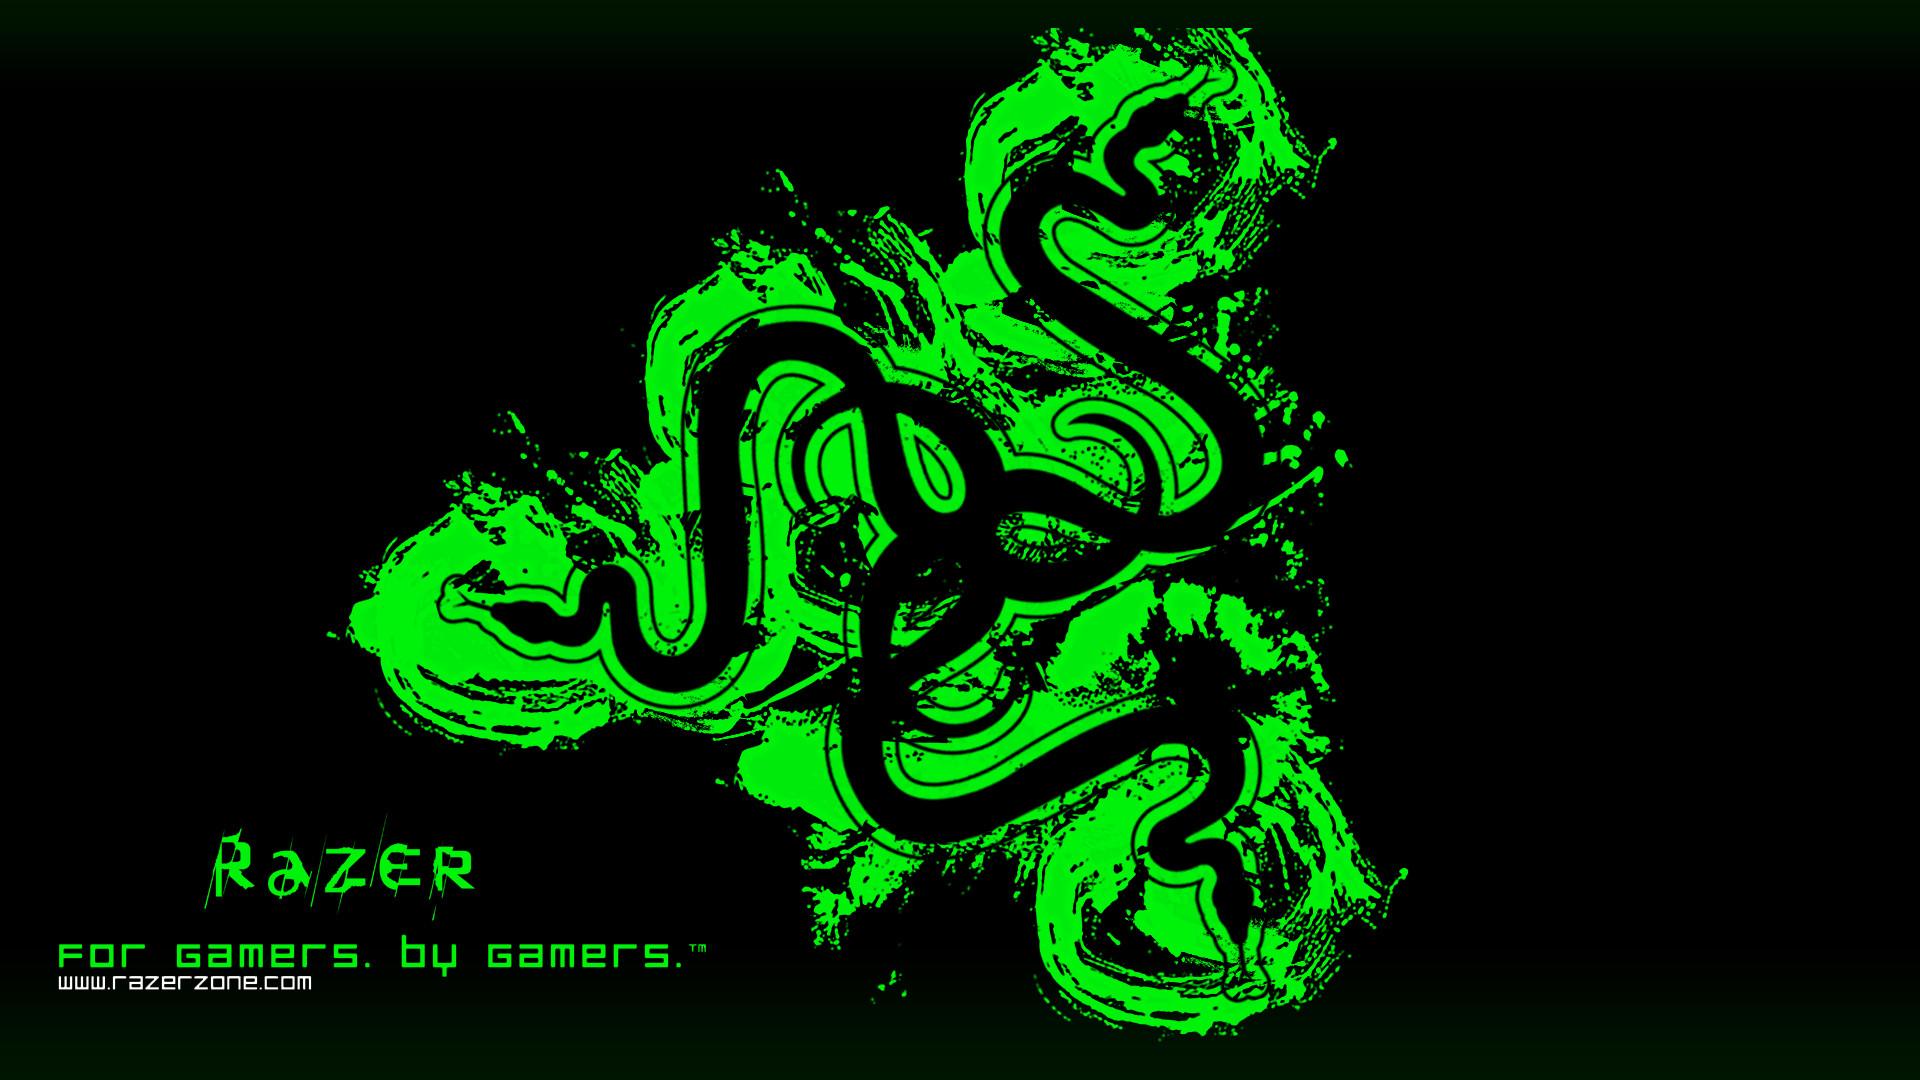 Razer Gaming Wallpapers – Wallpaper Cave